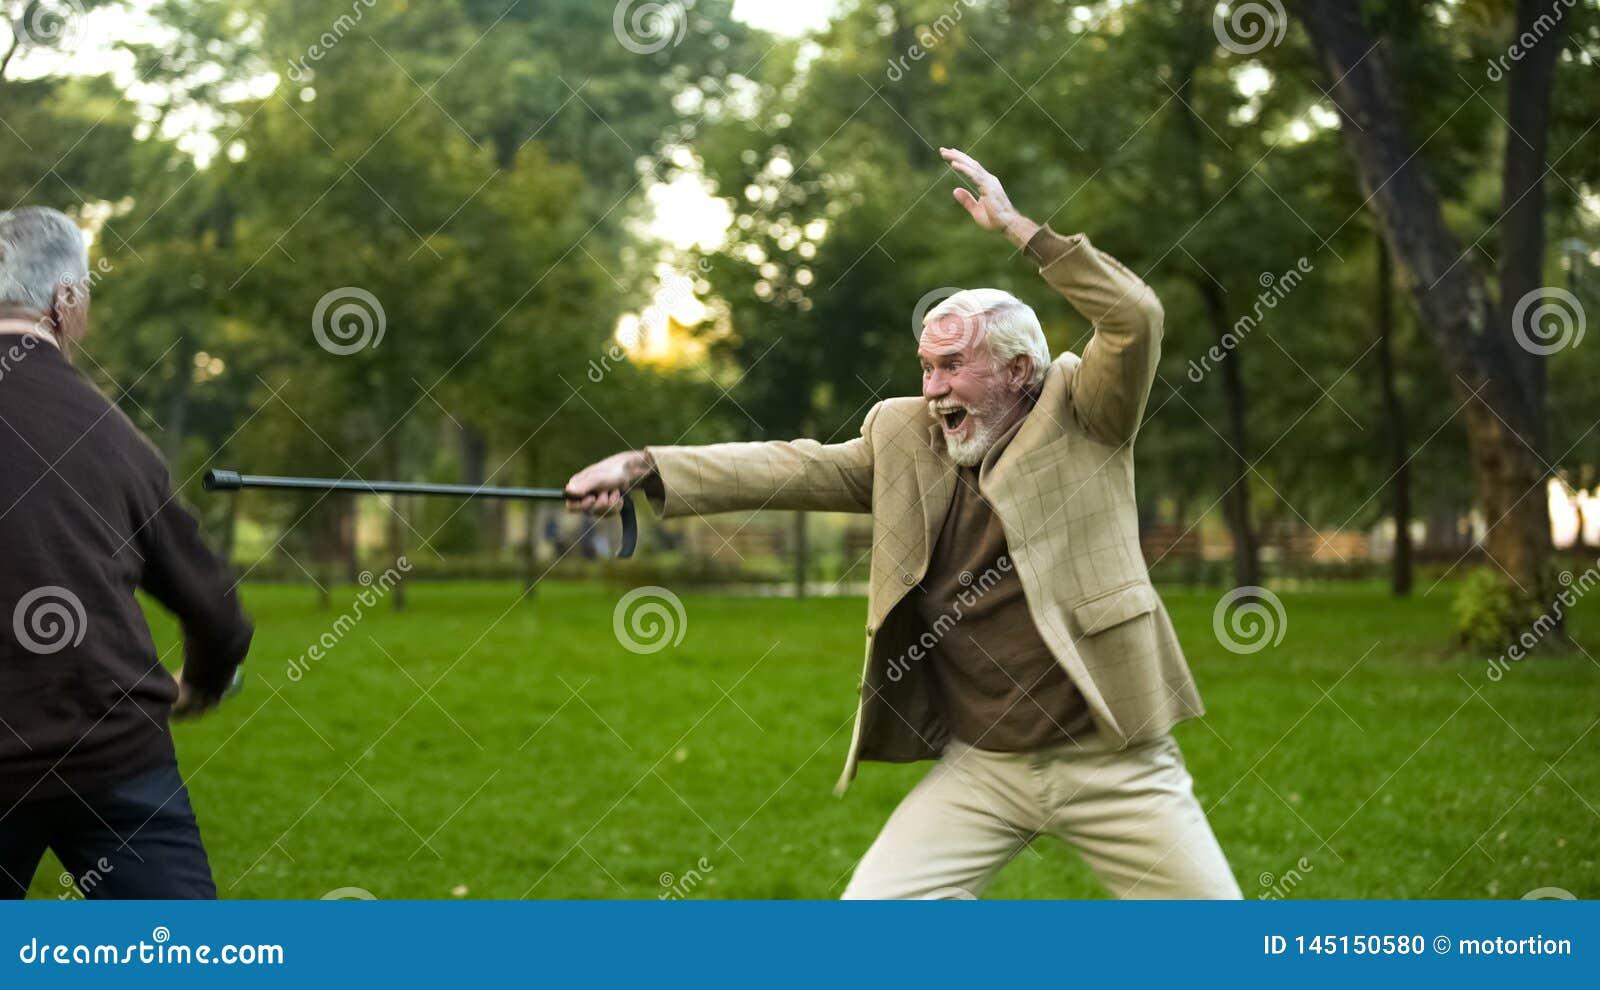 Mature friends having fun, fighting with walking sticks, pretending be knights